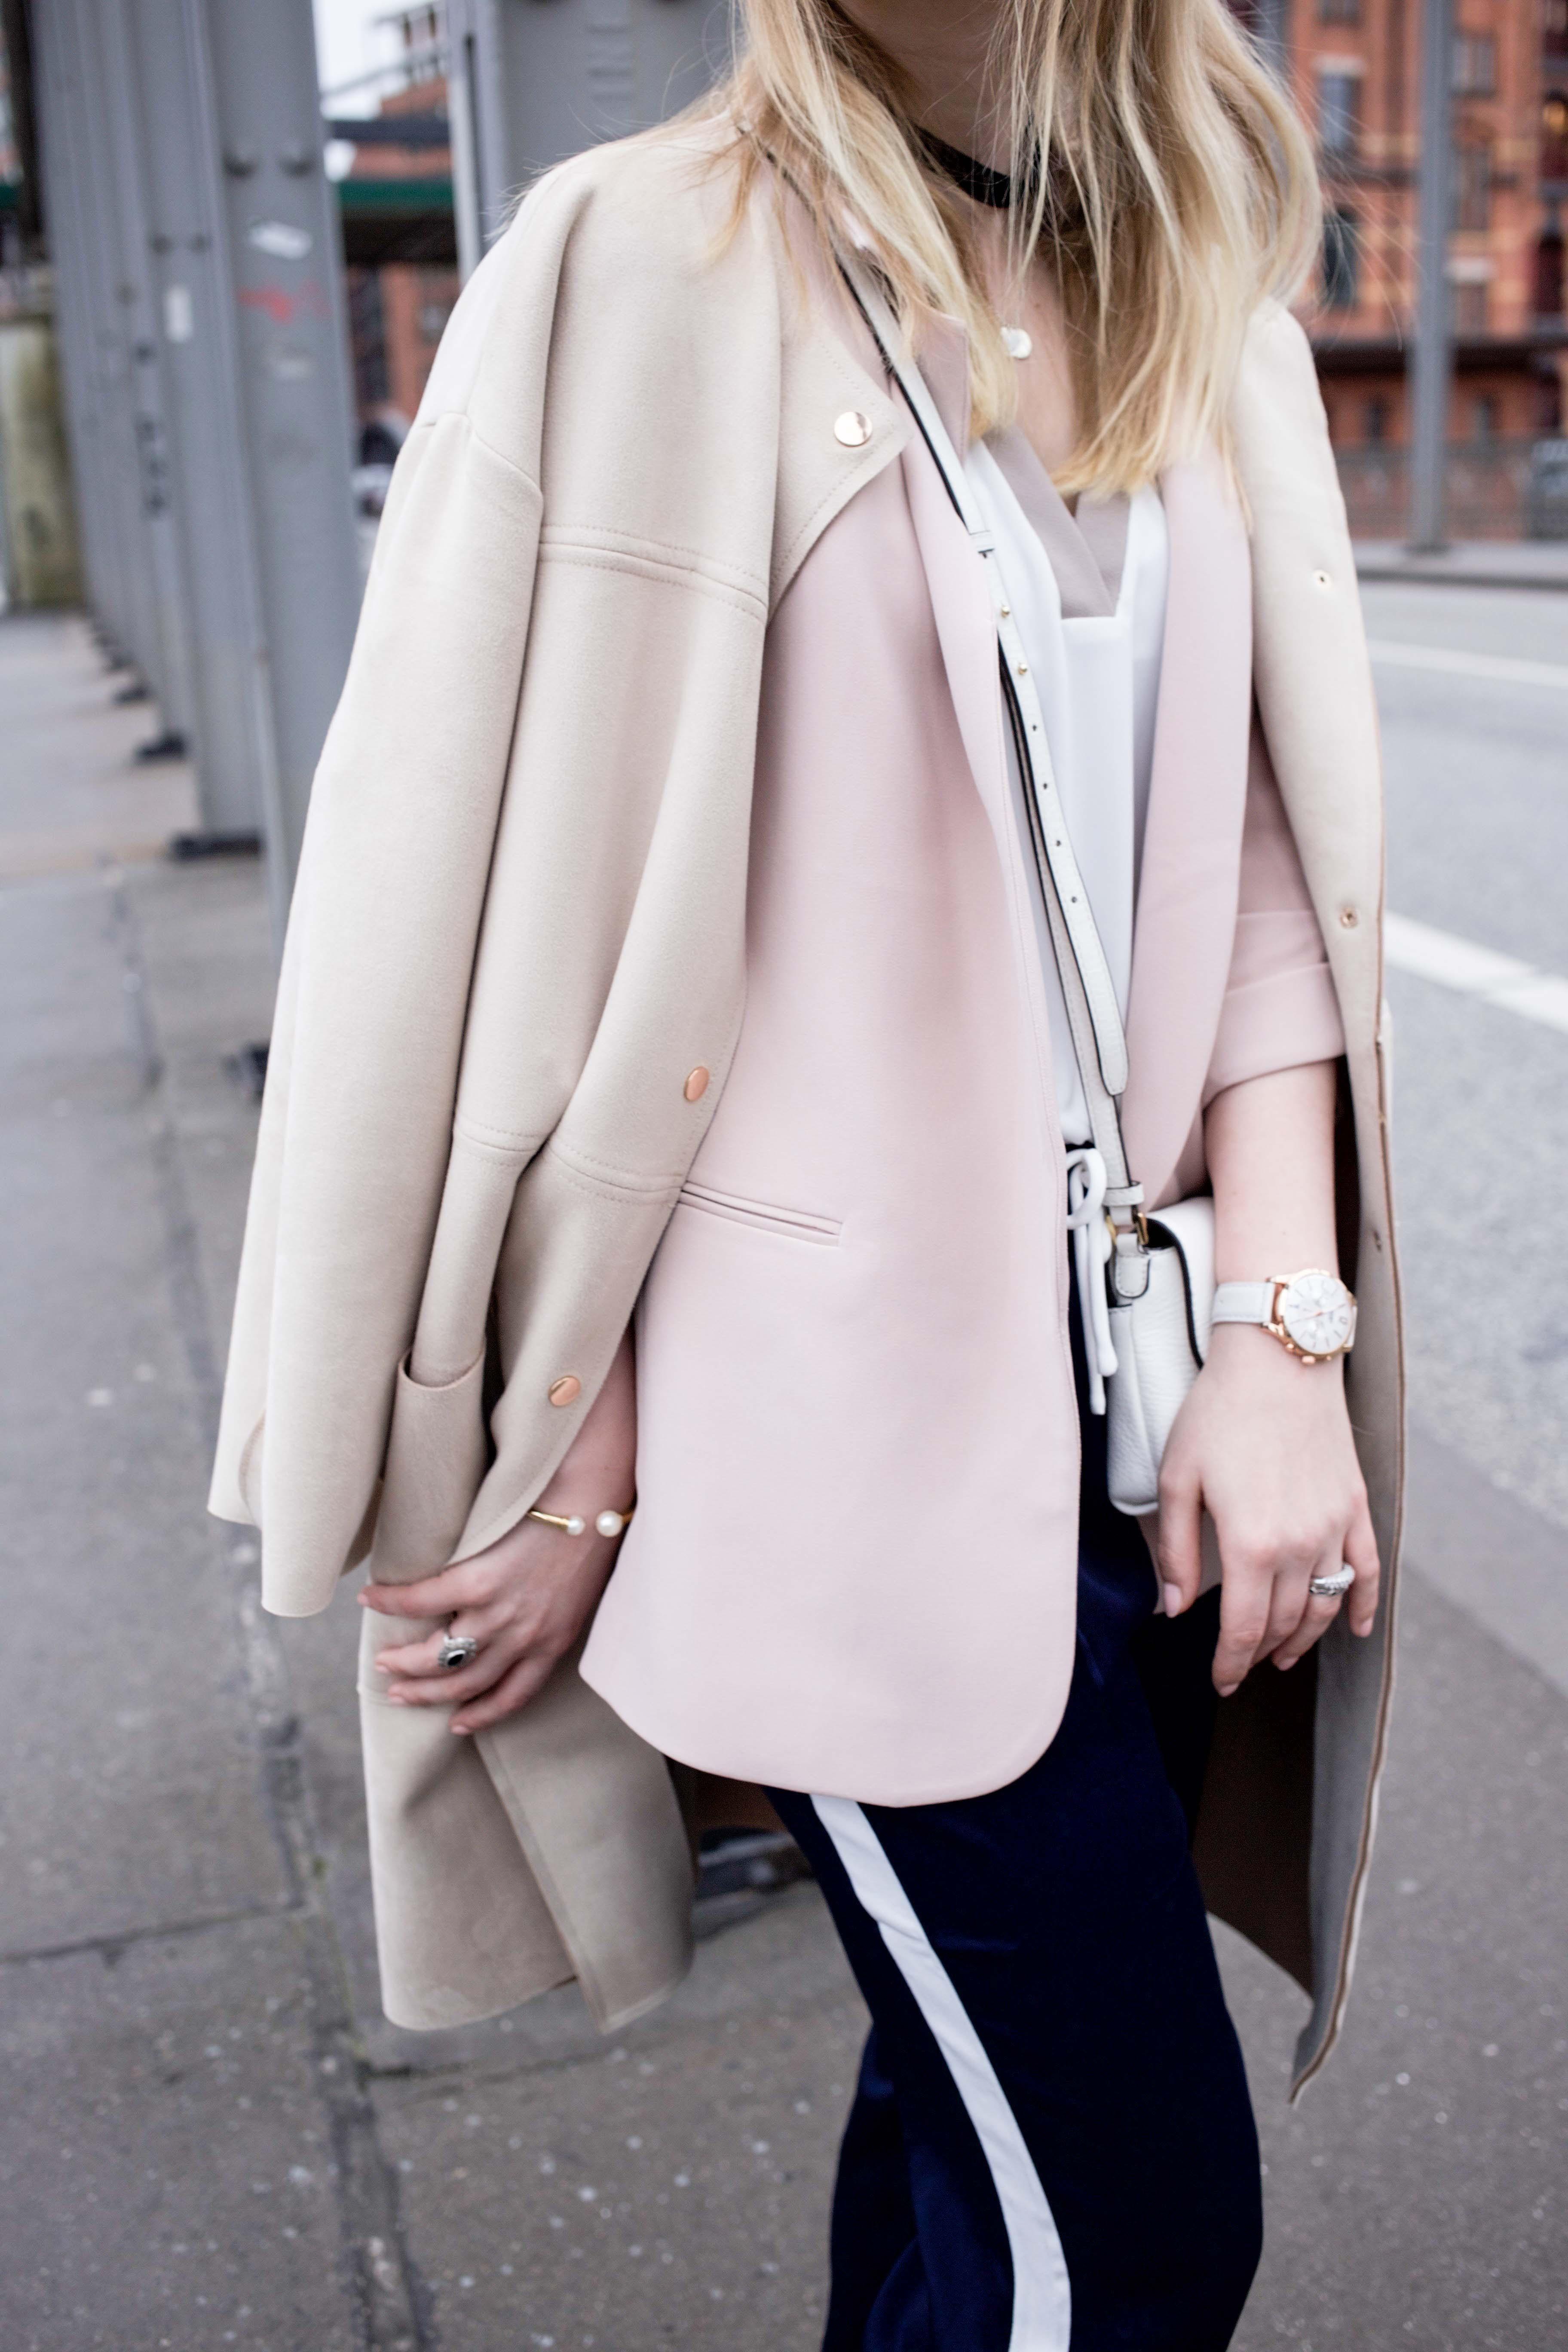 jogger-pants-streetstyle-look-hamburg-fashionblog-how-to-style_0754